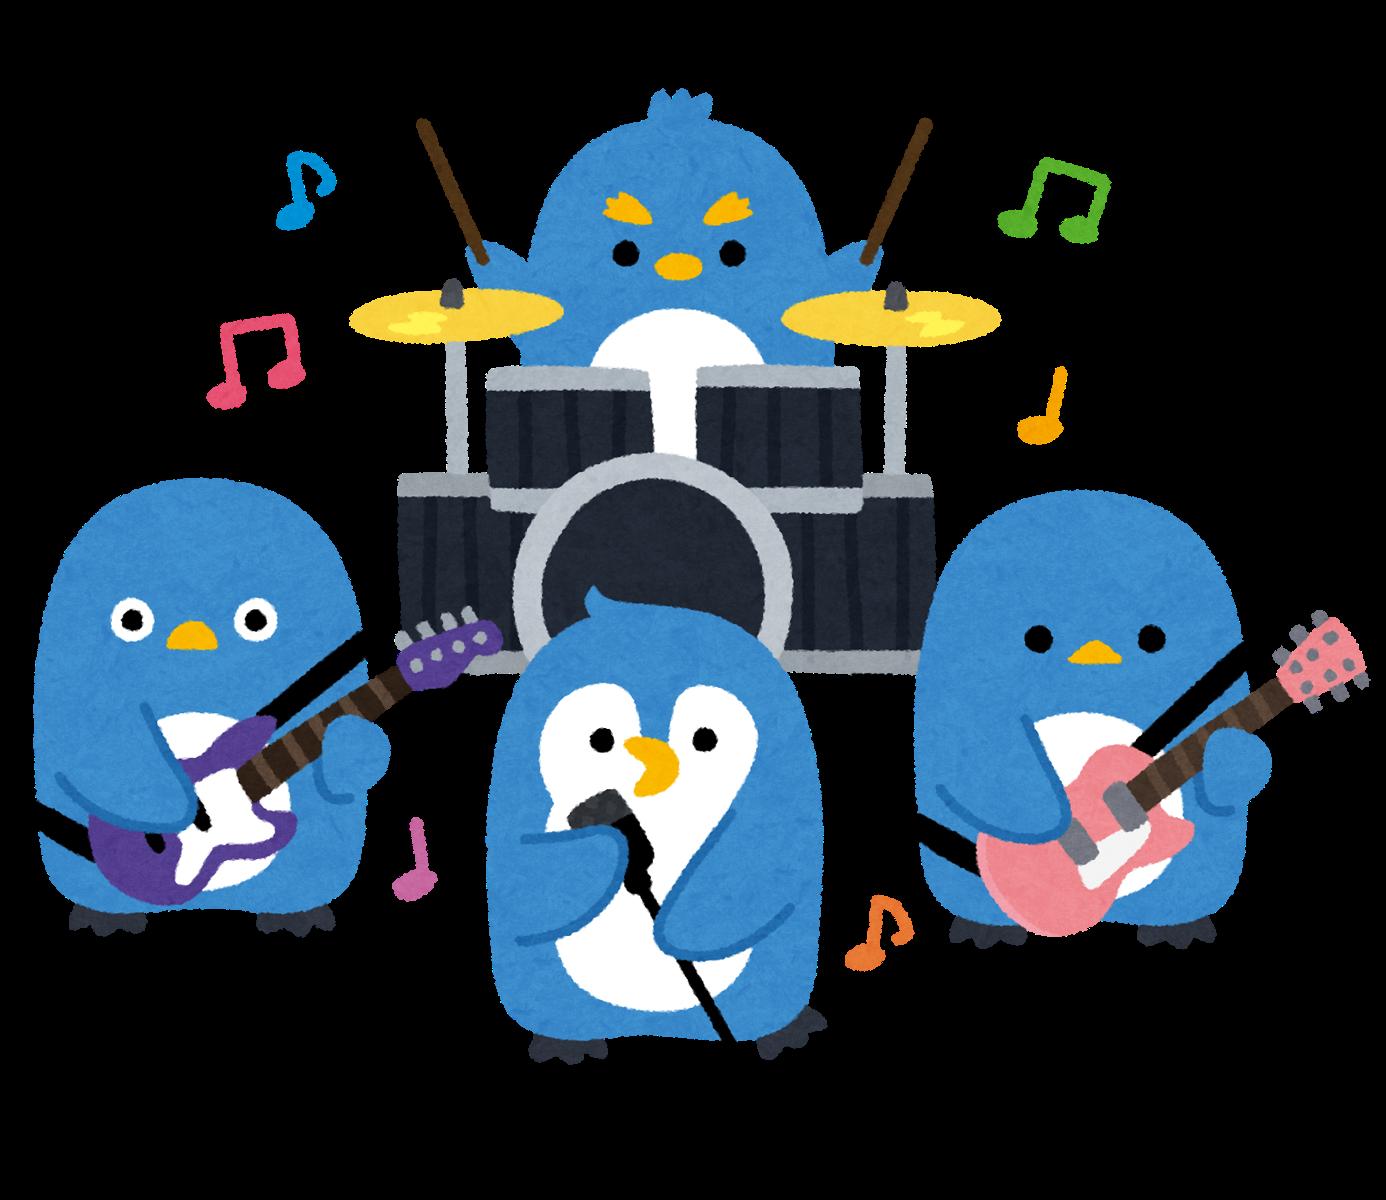 animal_penguin_music_band.png (1386×1200)